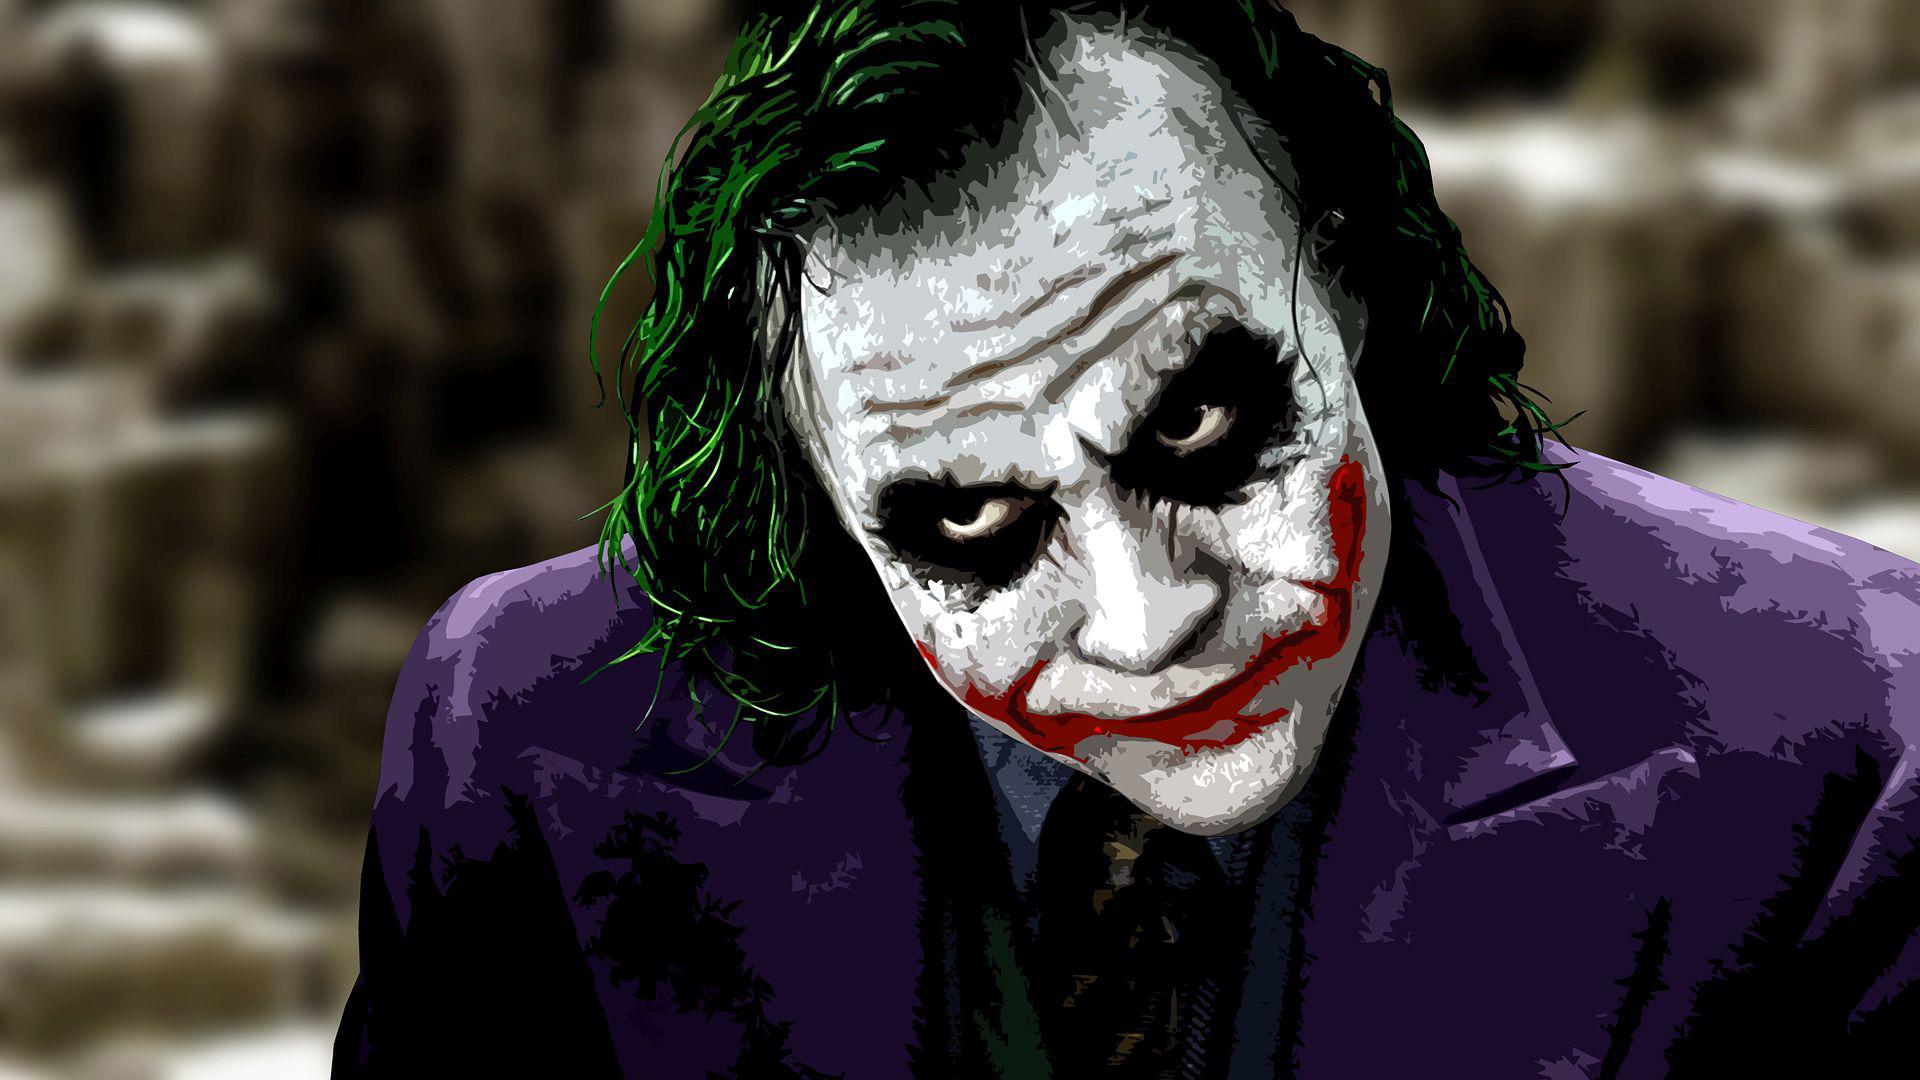 The Joker   The Dark Knight wallpaper 20424 1920x1080